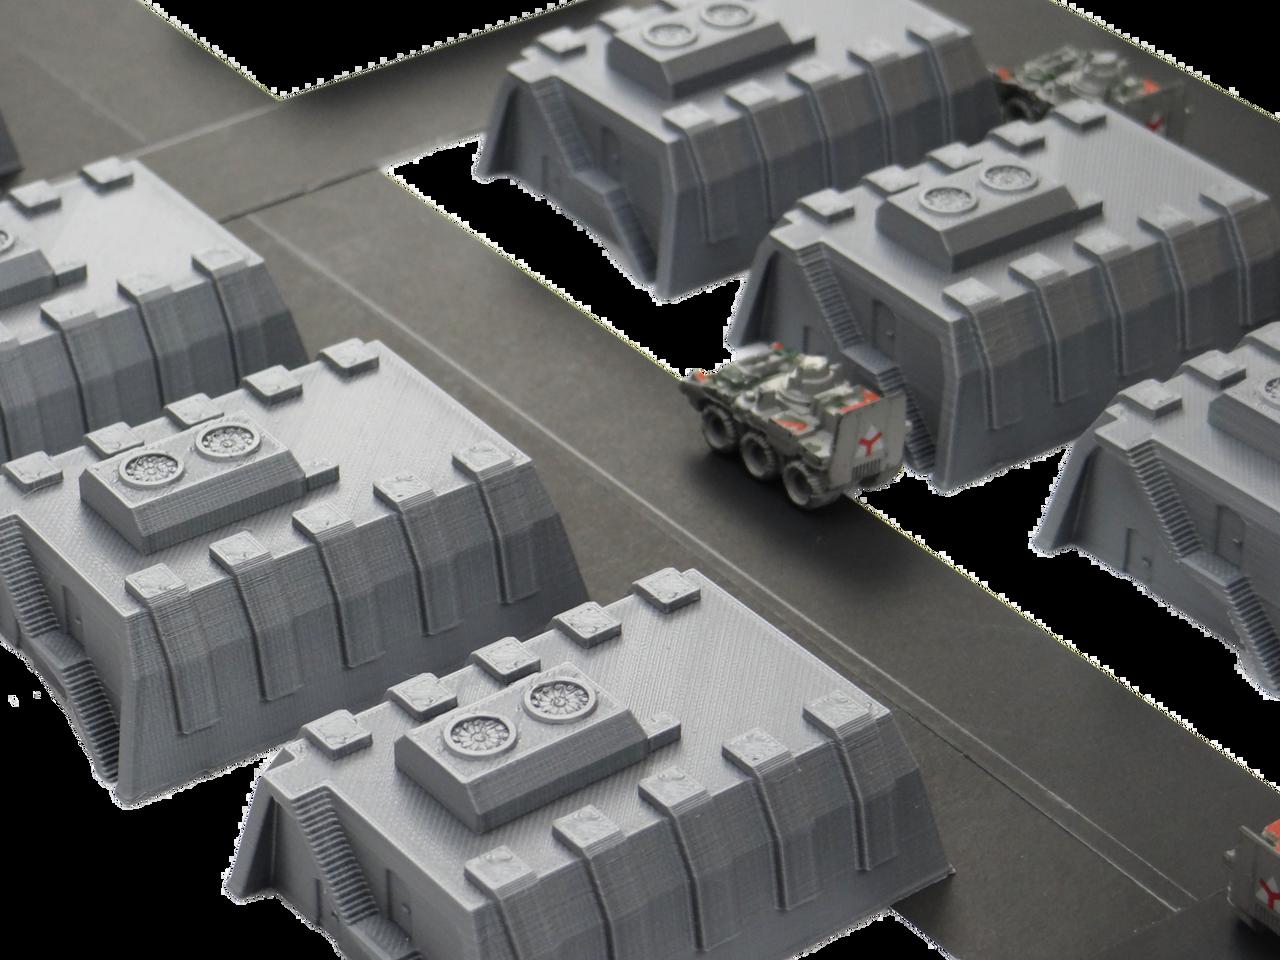 6mm Tank Garage Wargaming Terrain with roads